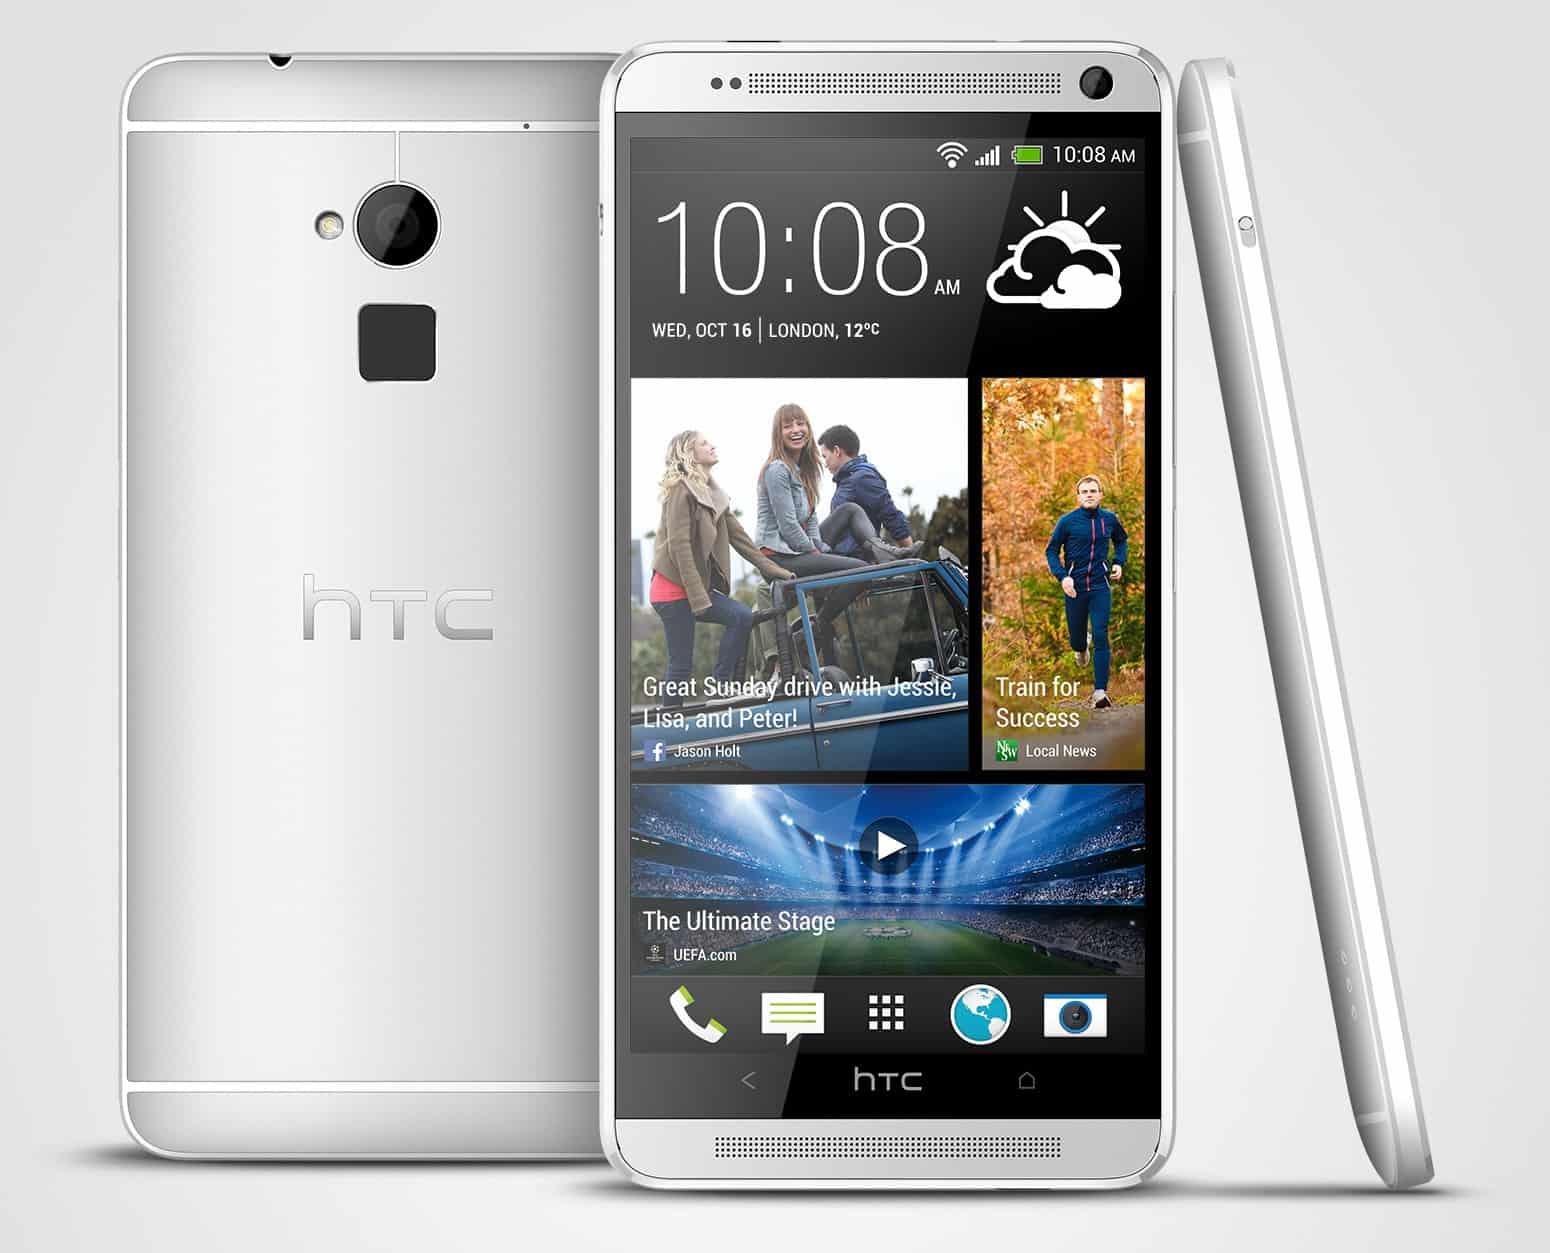 HTC One Max full